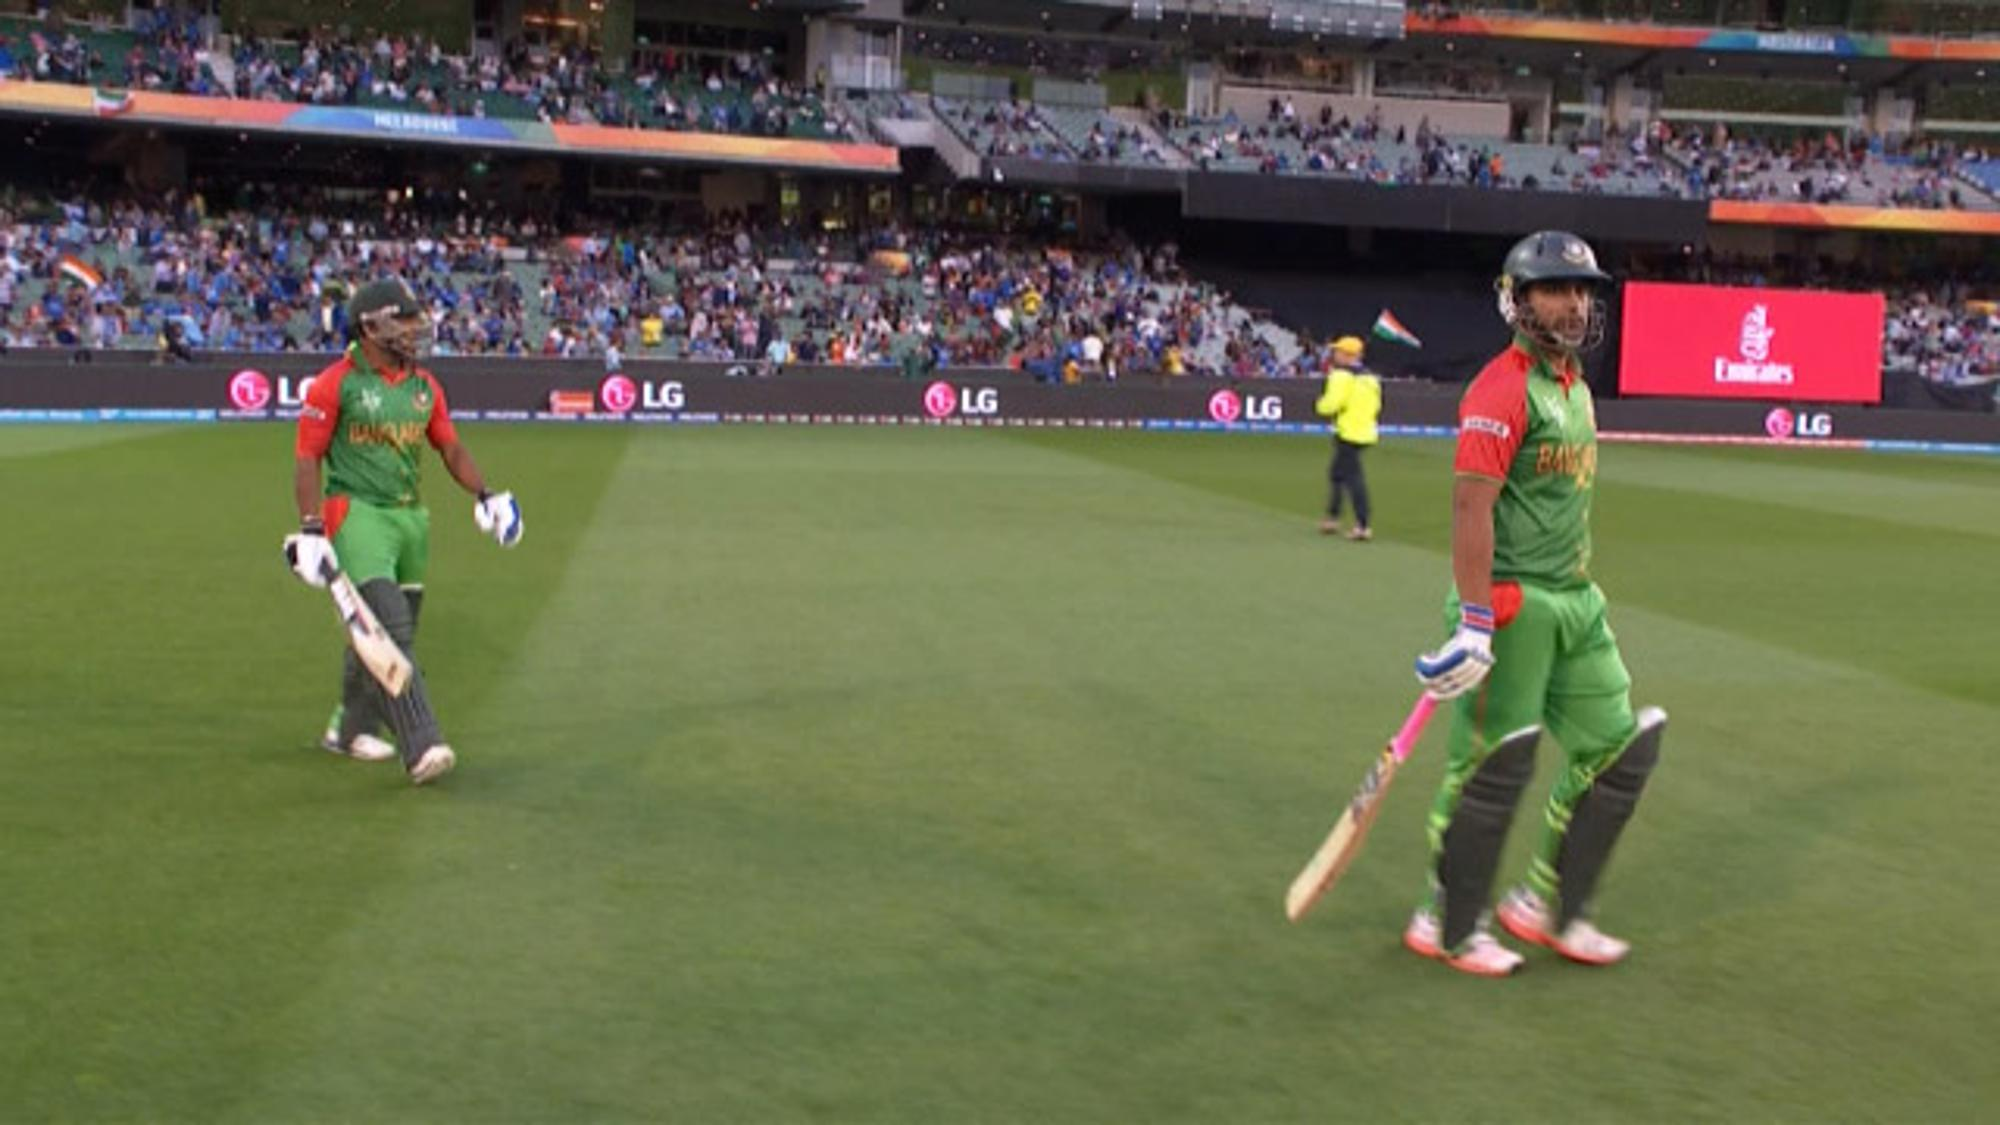 CWC15 IND vs BAN QF - Bangladesh innings highlights